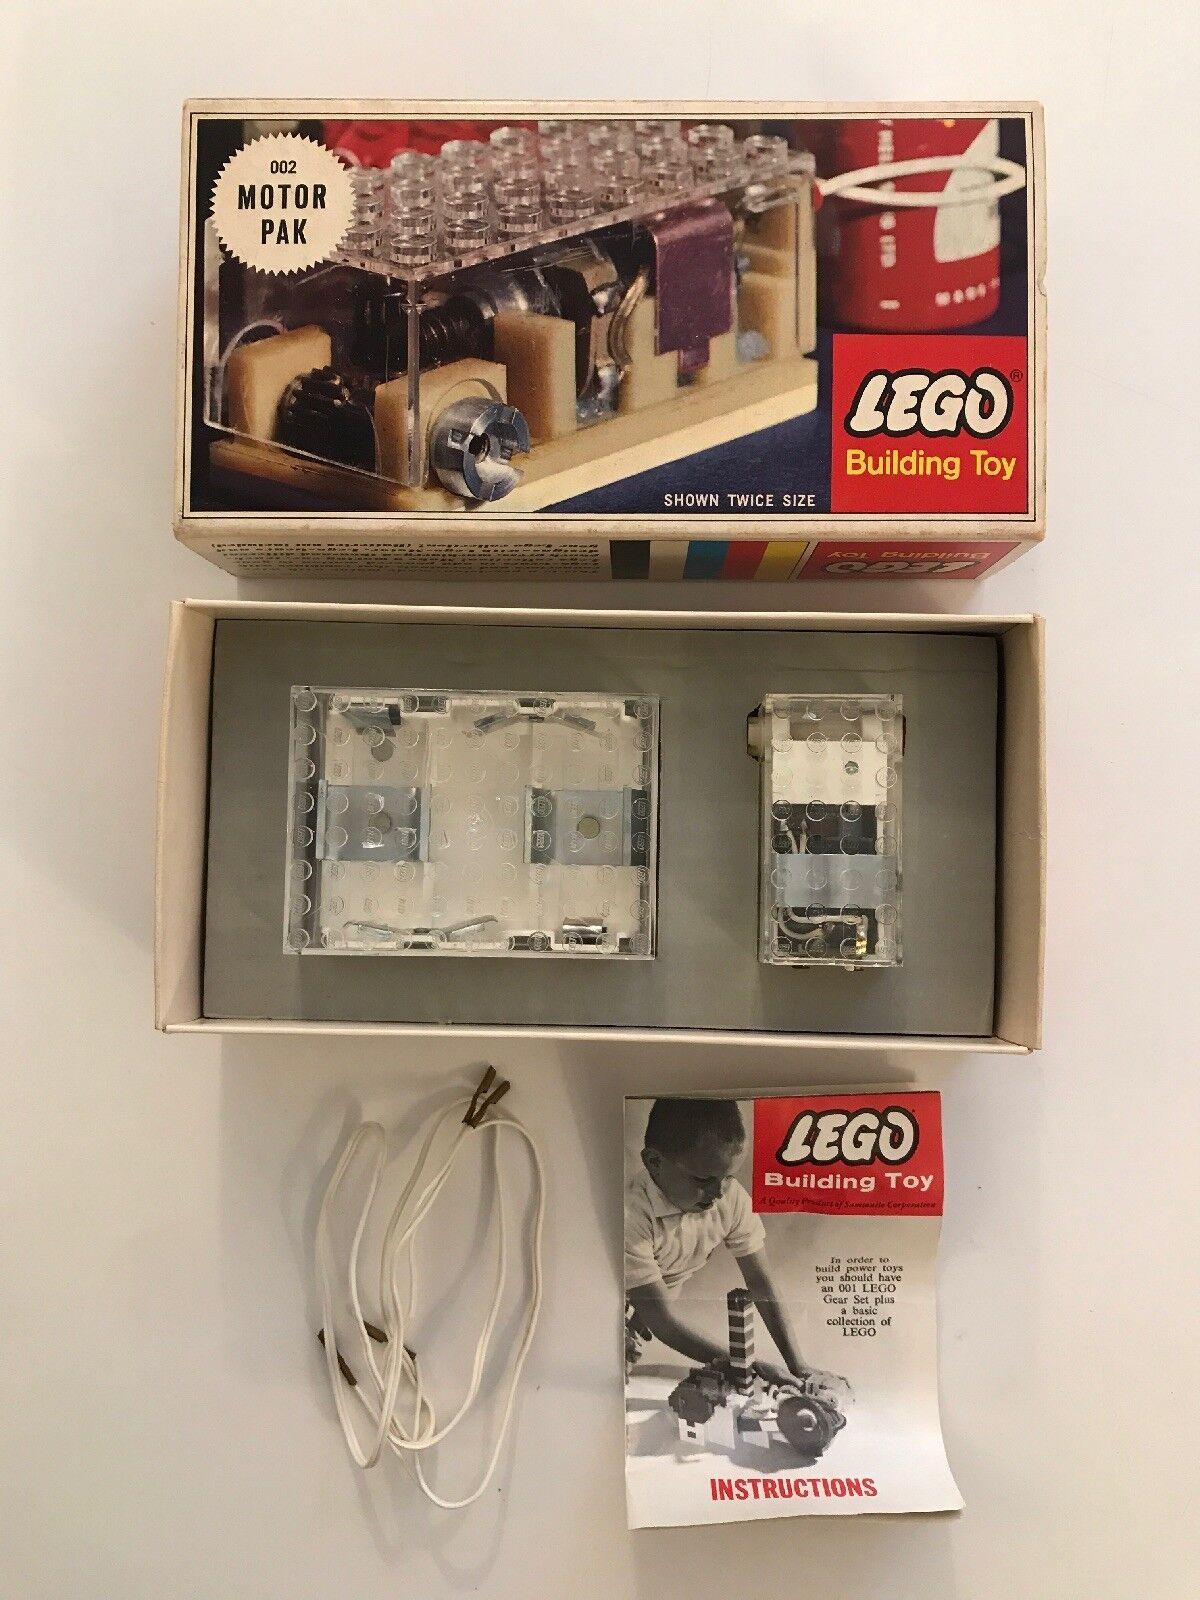 Vintage RARE 1963 LEGO 002 Motor Pak in ORIGINAL BOX